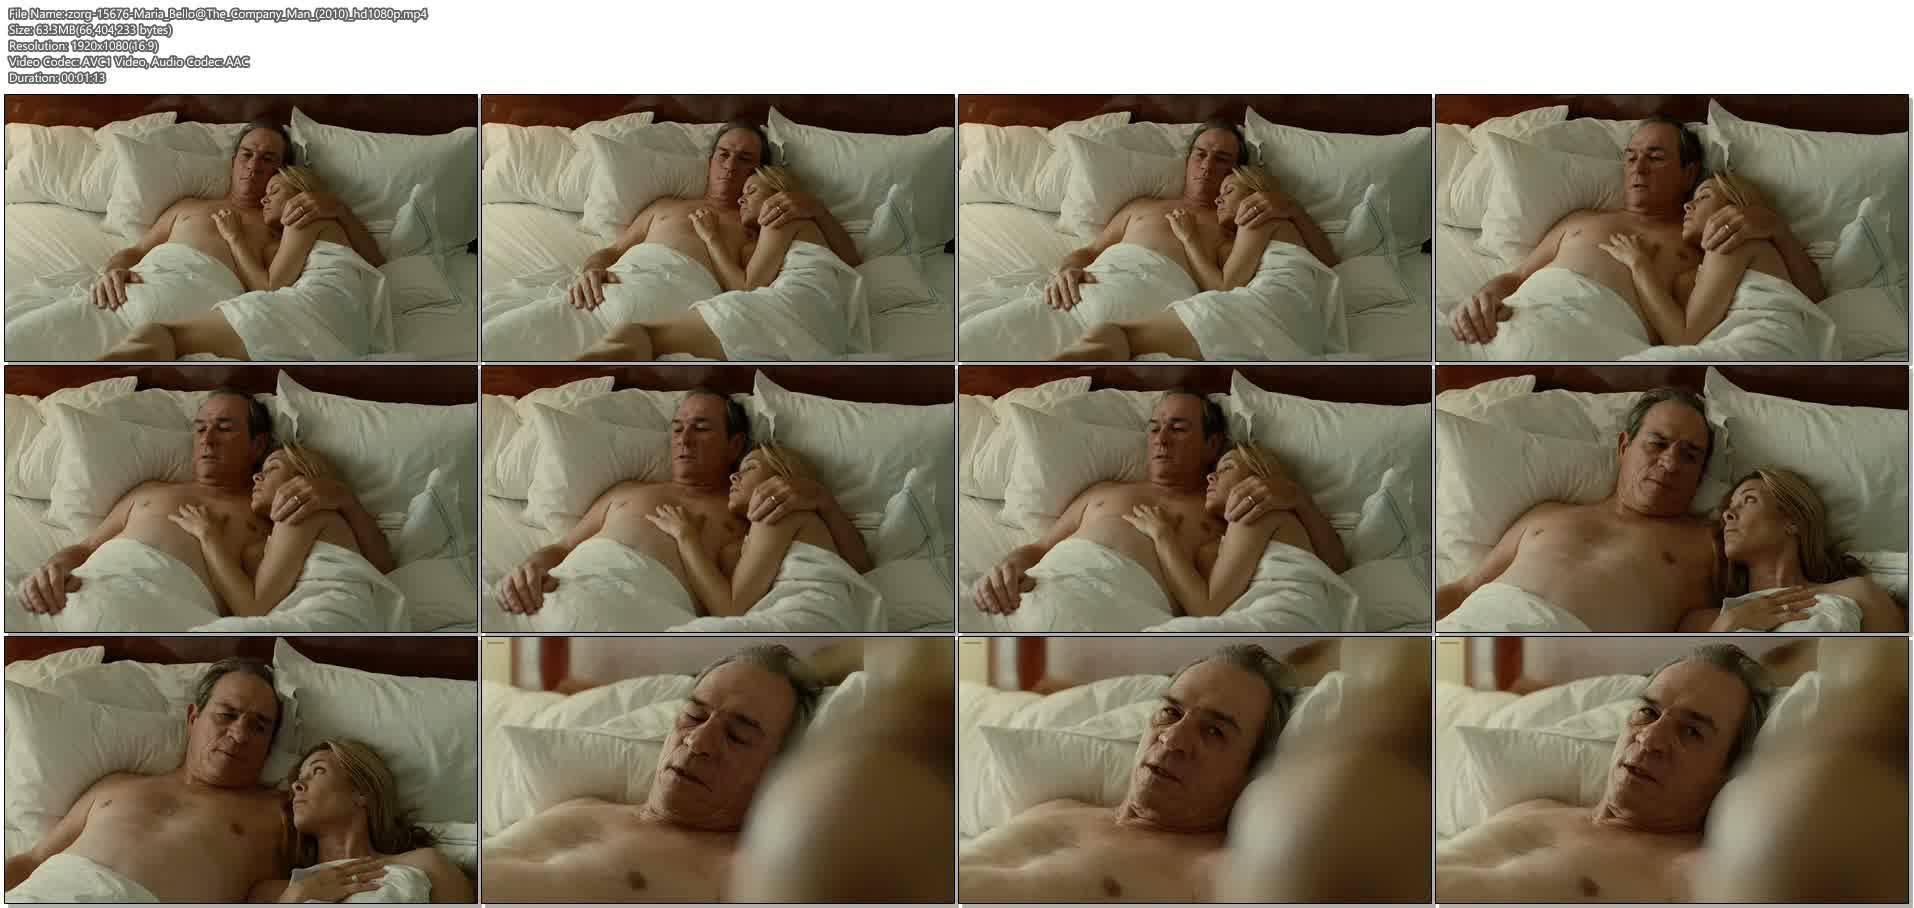 Maria Bello nude topless - The Company Man (2010) HD 1080p (6)